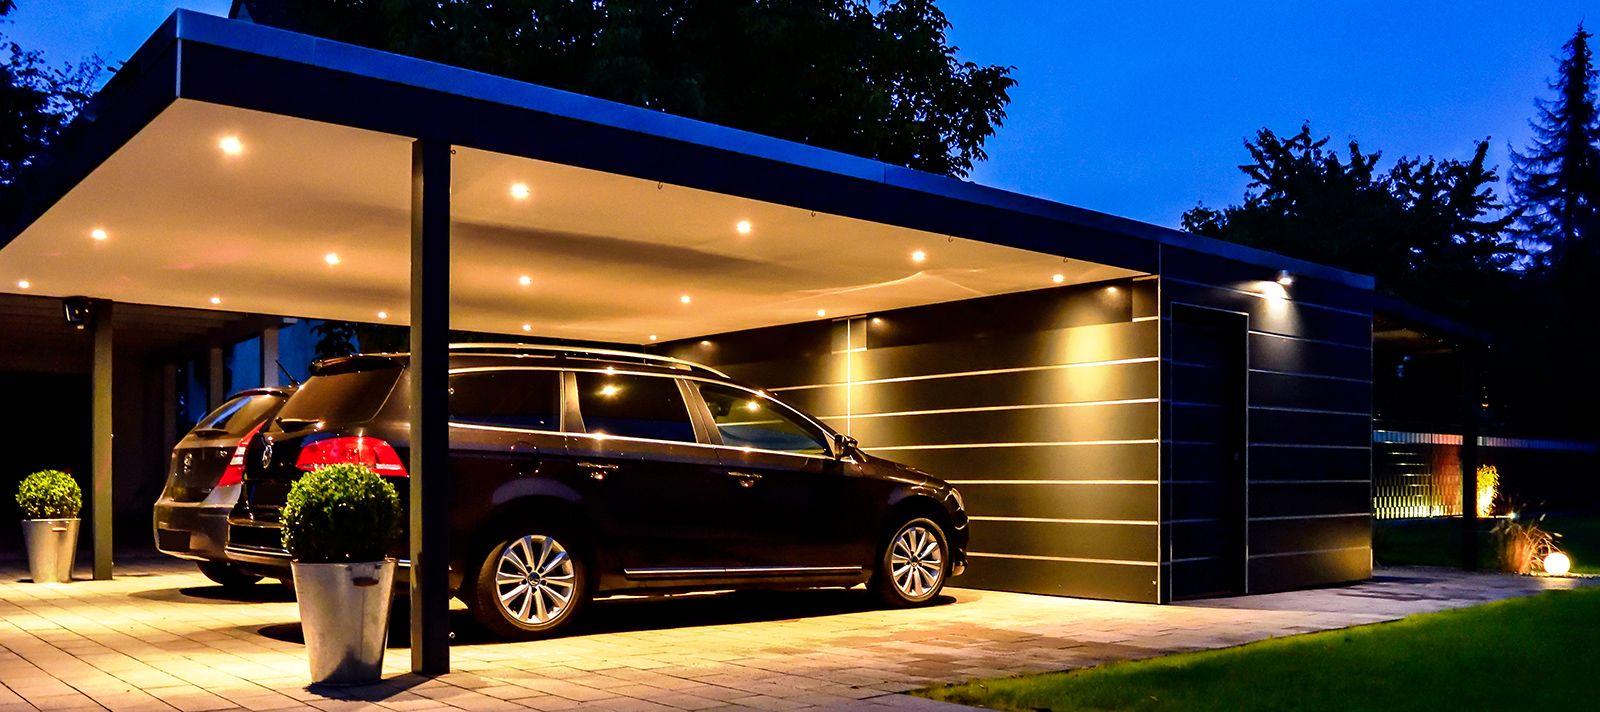 carport bauhaus hpl pfiff carports gartenh tte pinterest carport garage und haus. Black Bedroom Furniture Sets. Home Design Ideas